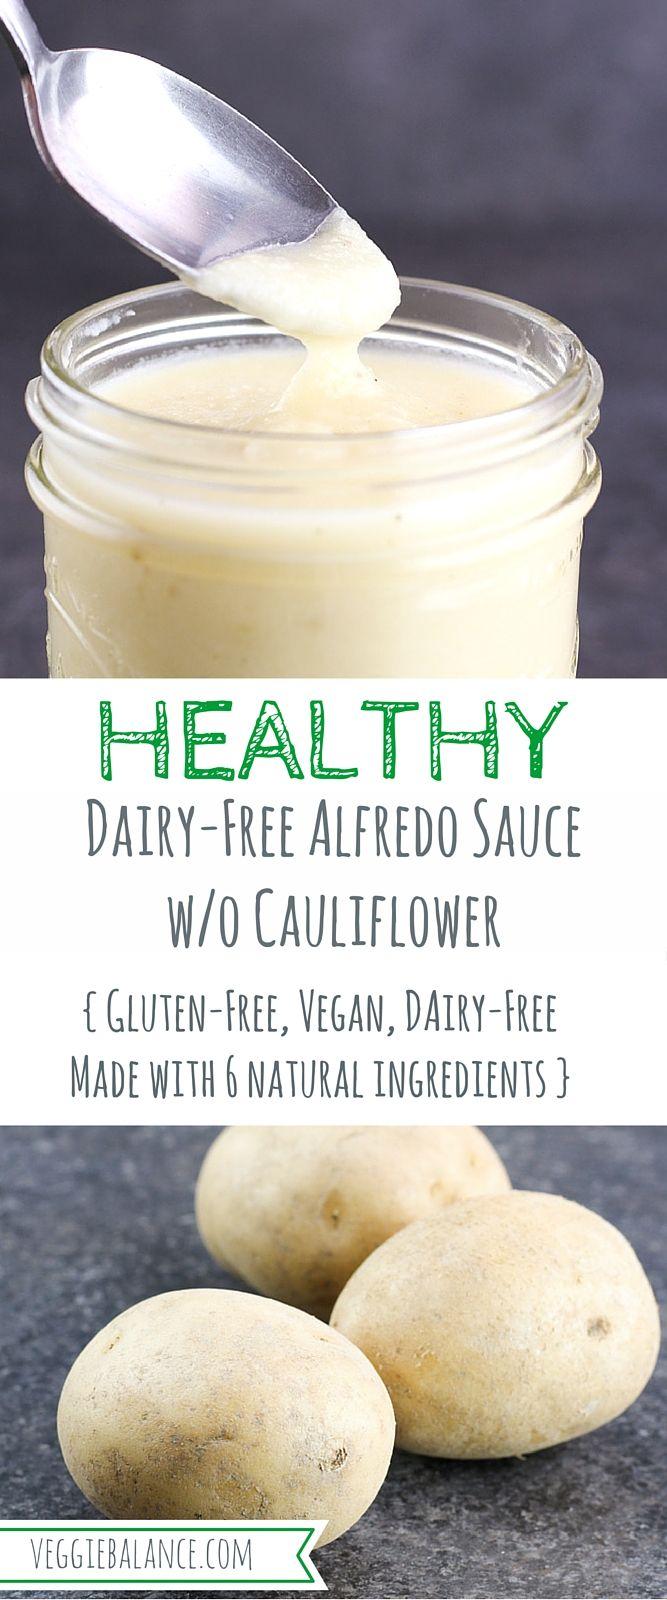 Dairy-Free Alfredo Sauce without Cauliflower {Gluten-Free, Vegan, Only 6 natural ingredients}